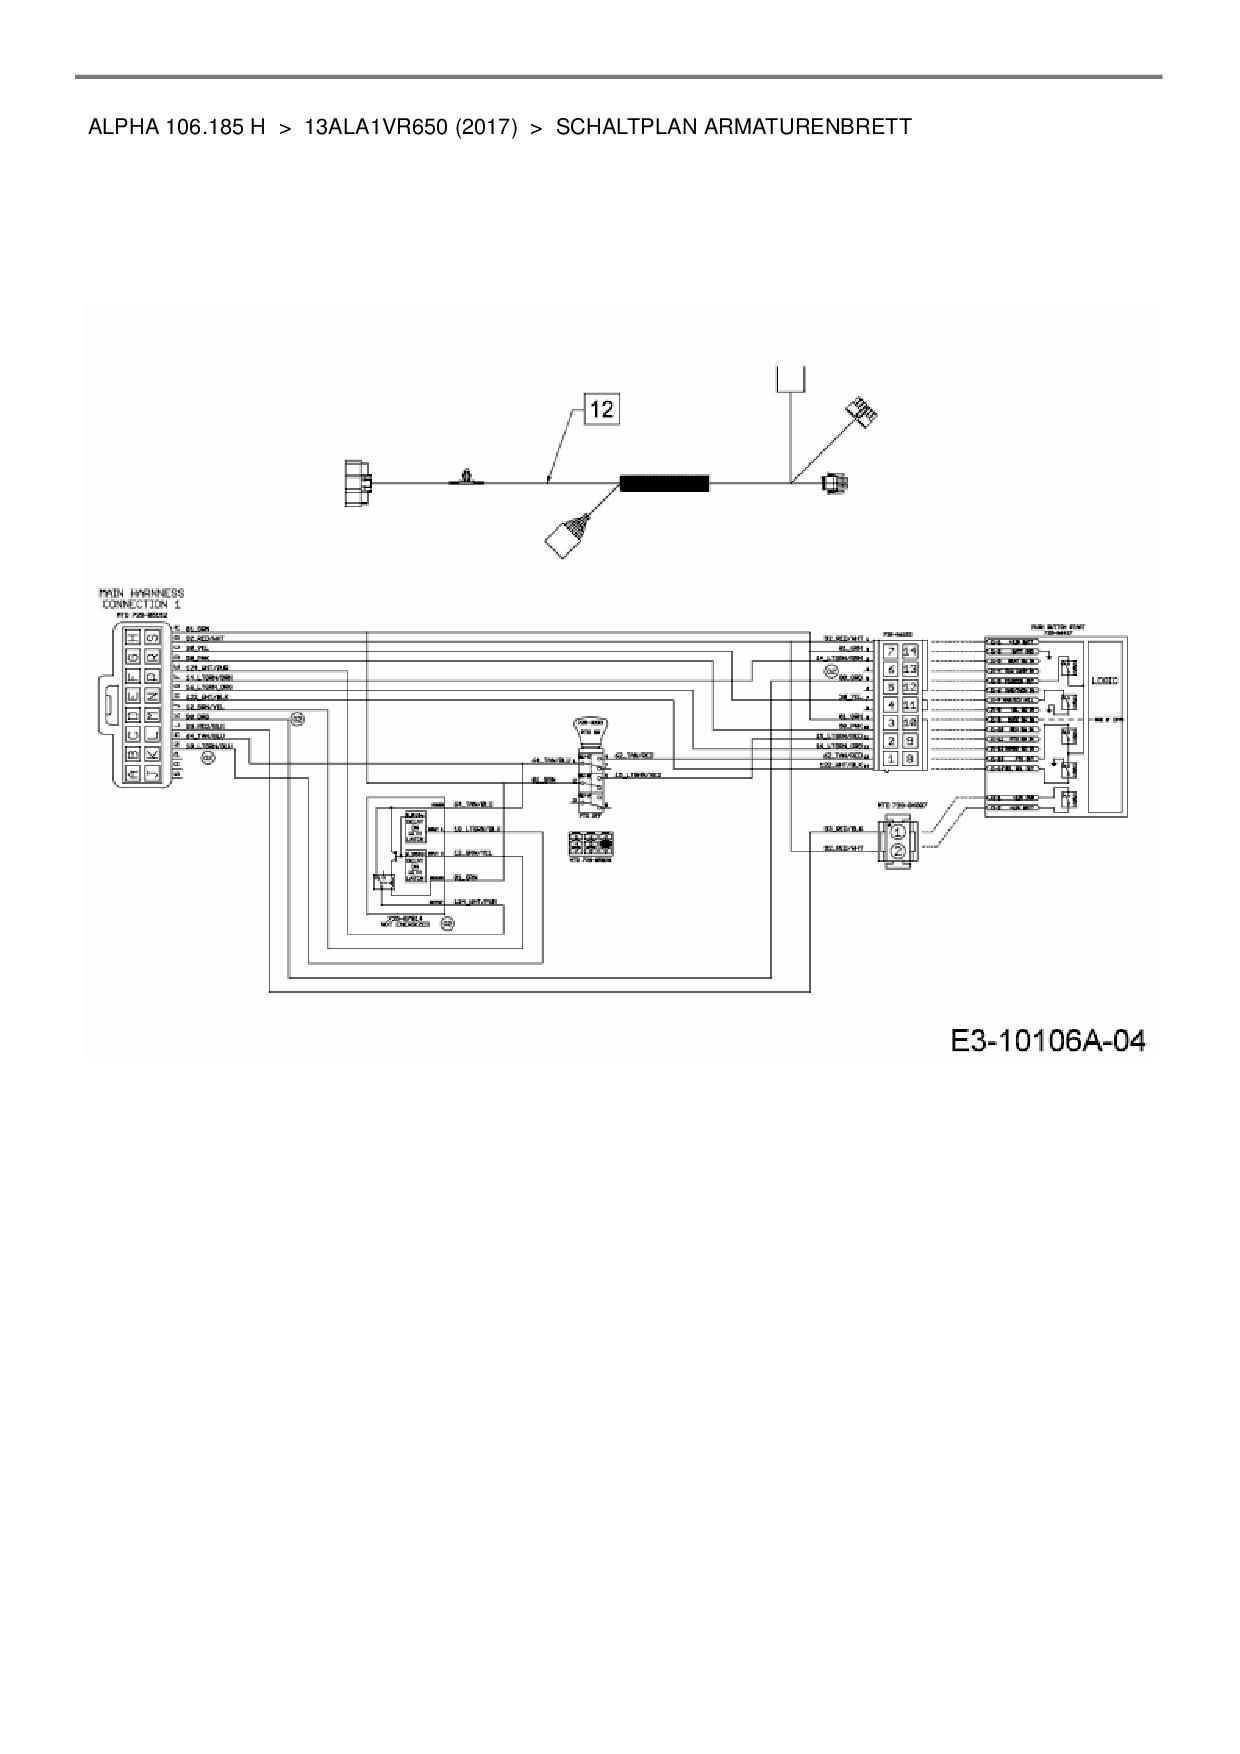 Erfreut Mtd Kabelbaum Diagramm Bilder - Schaltplan Serie Circuit ...